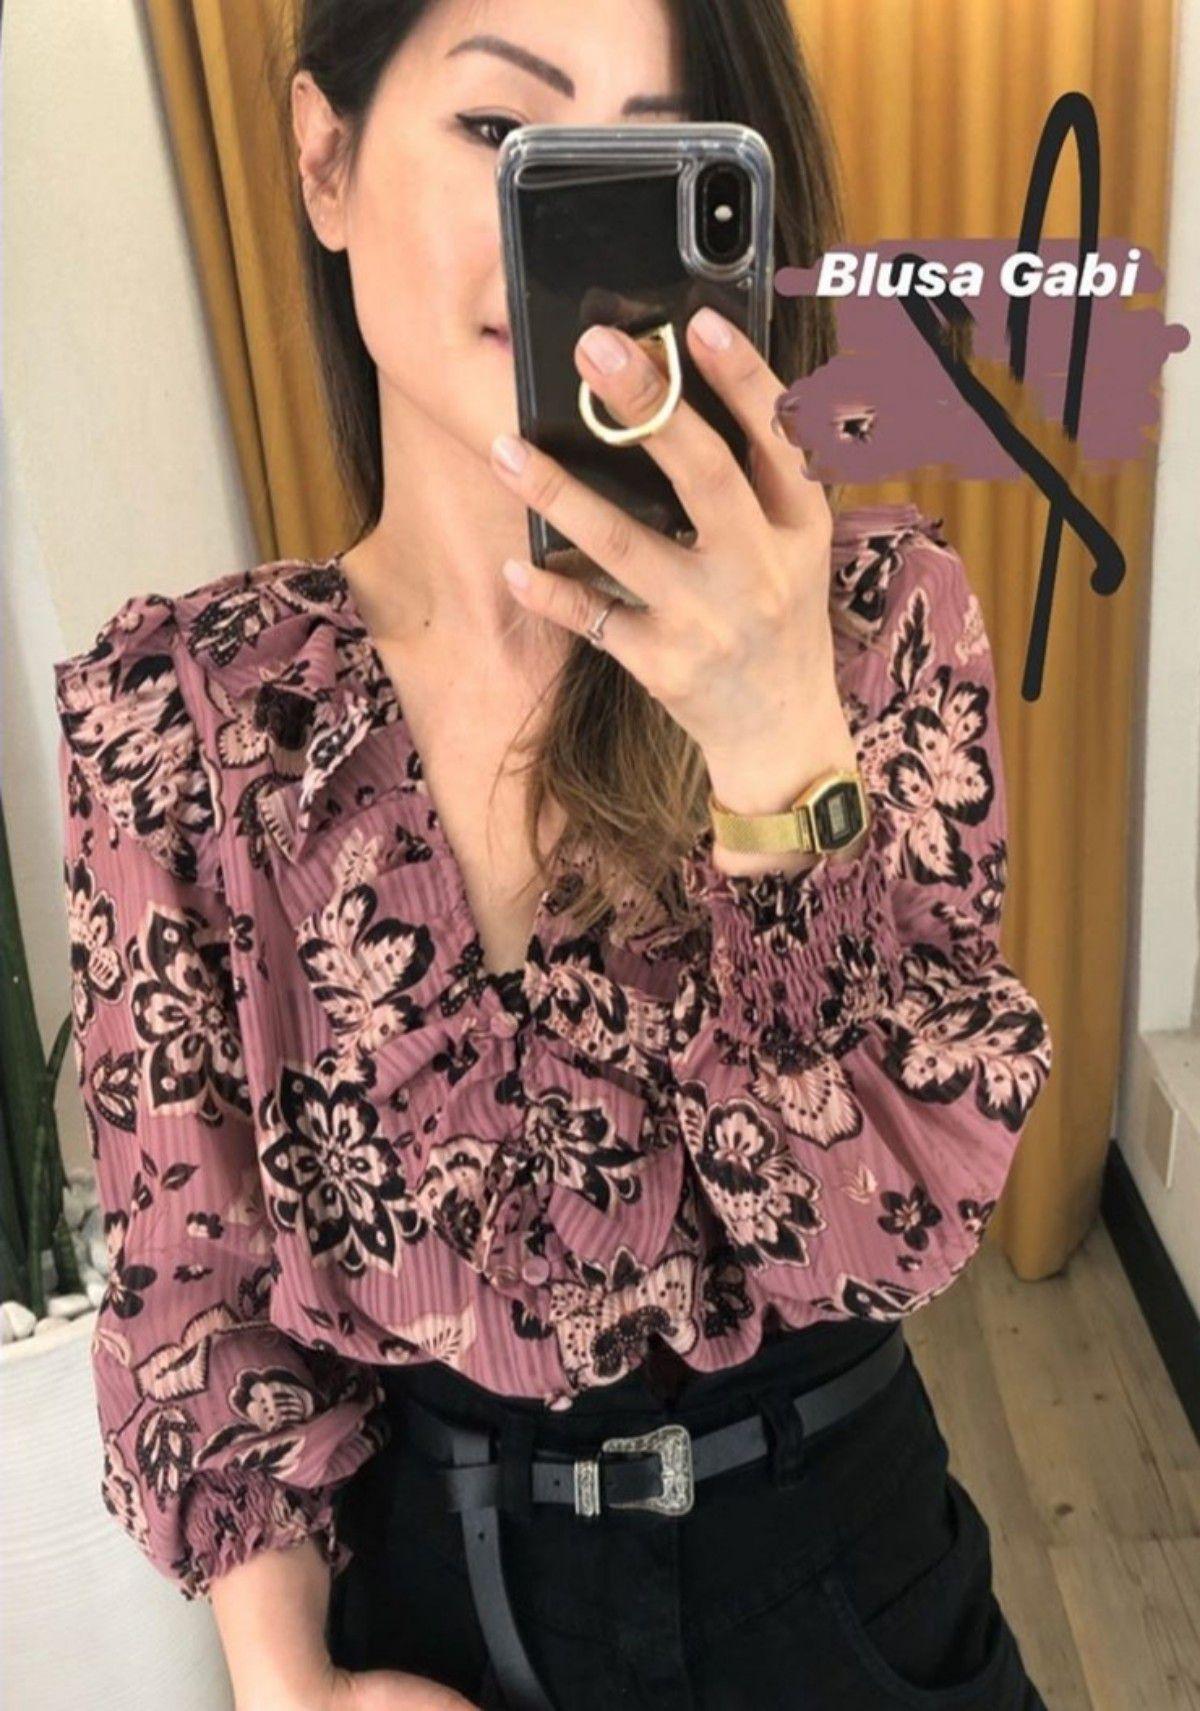 Blusa Gabi